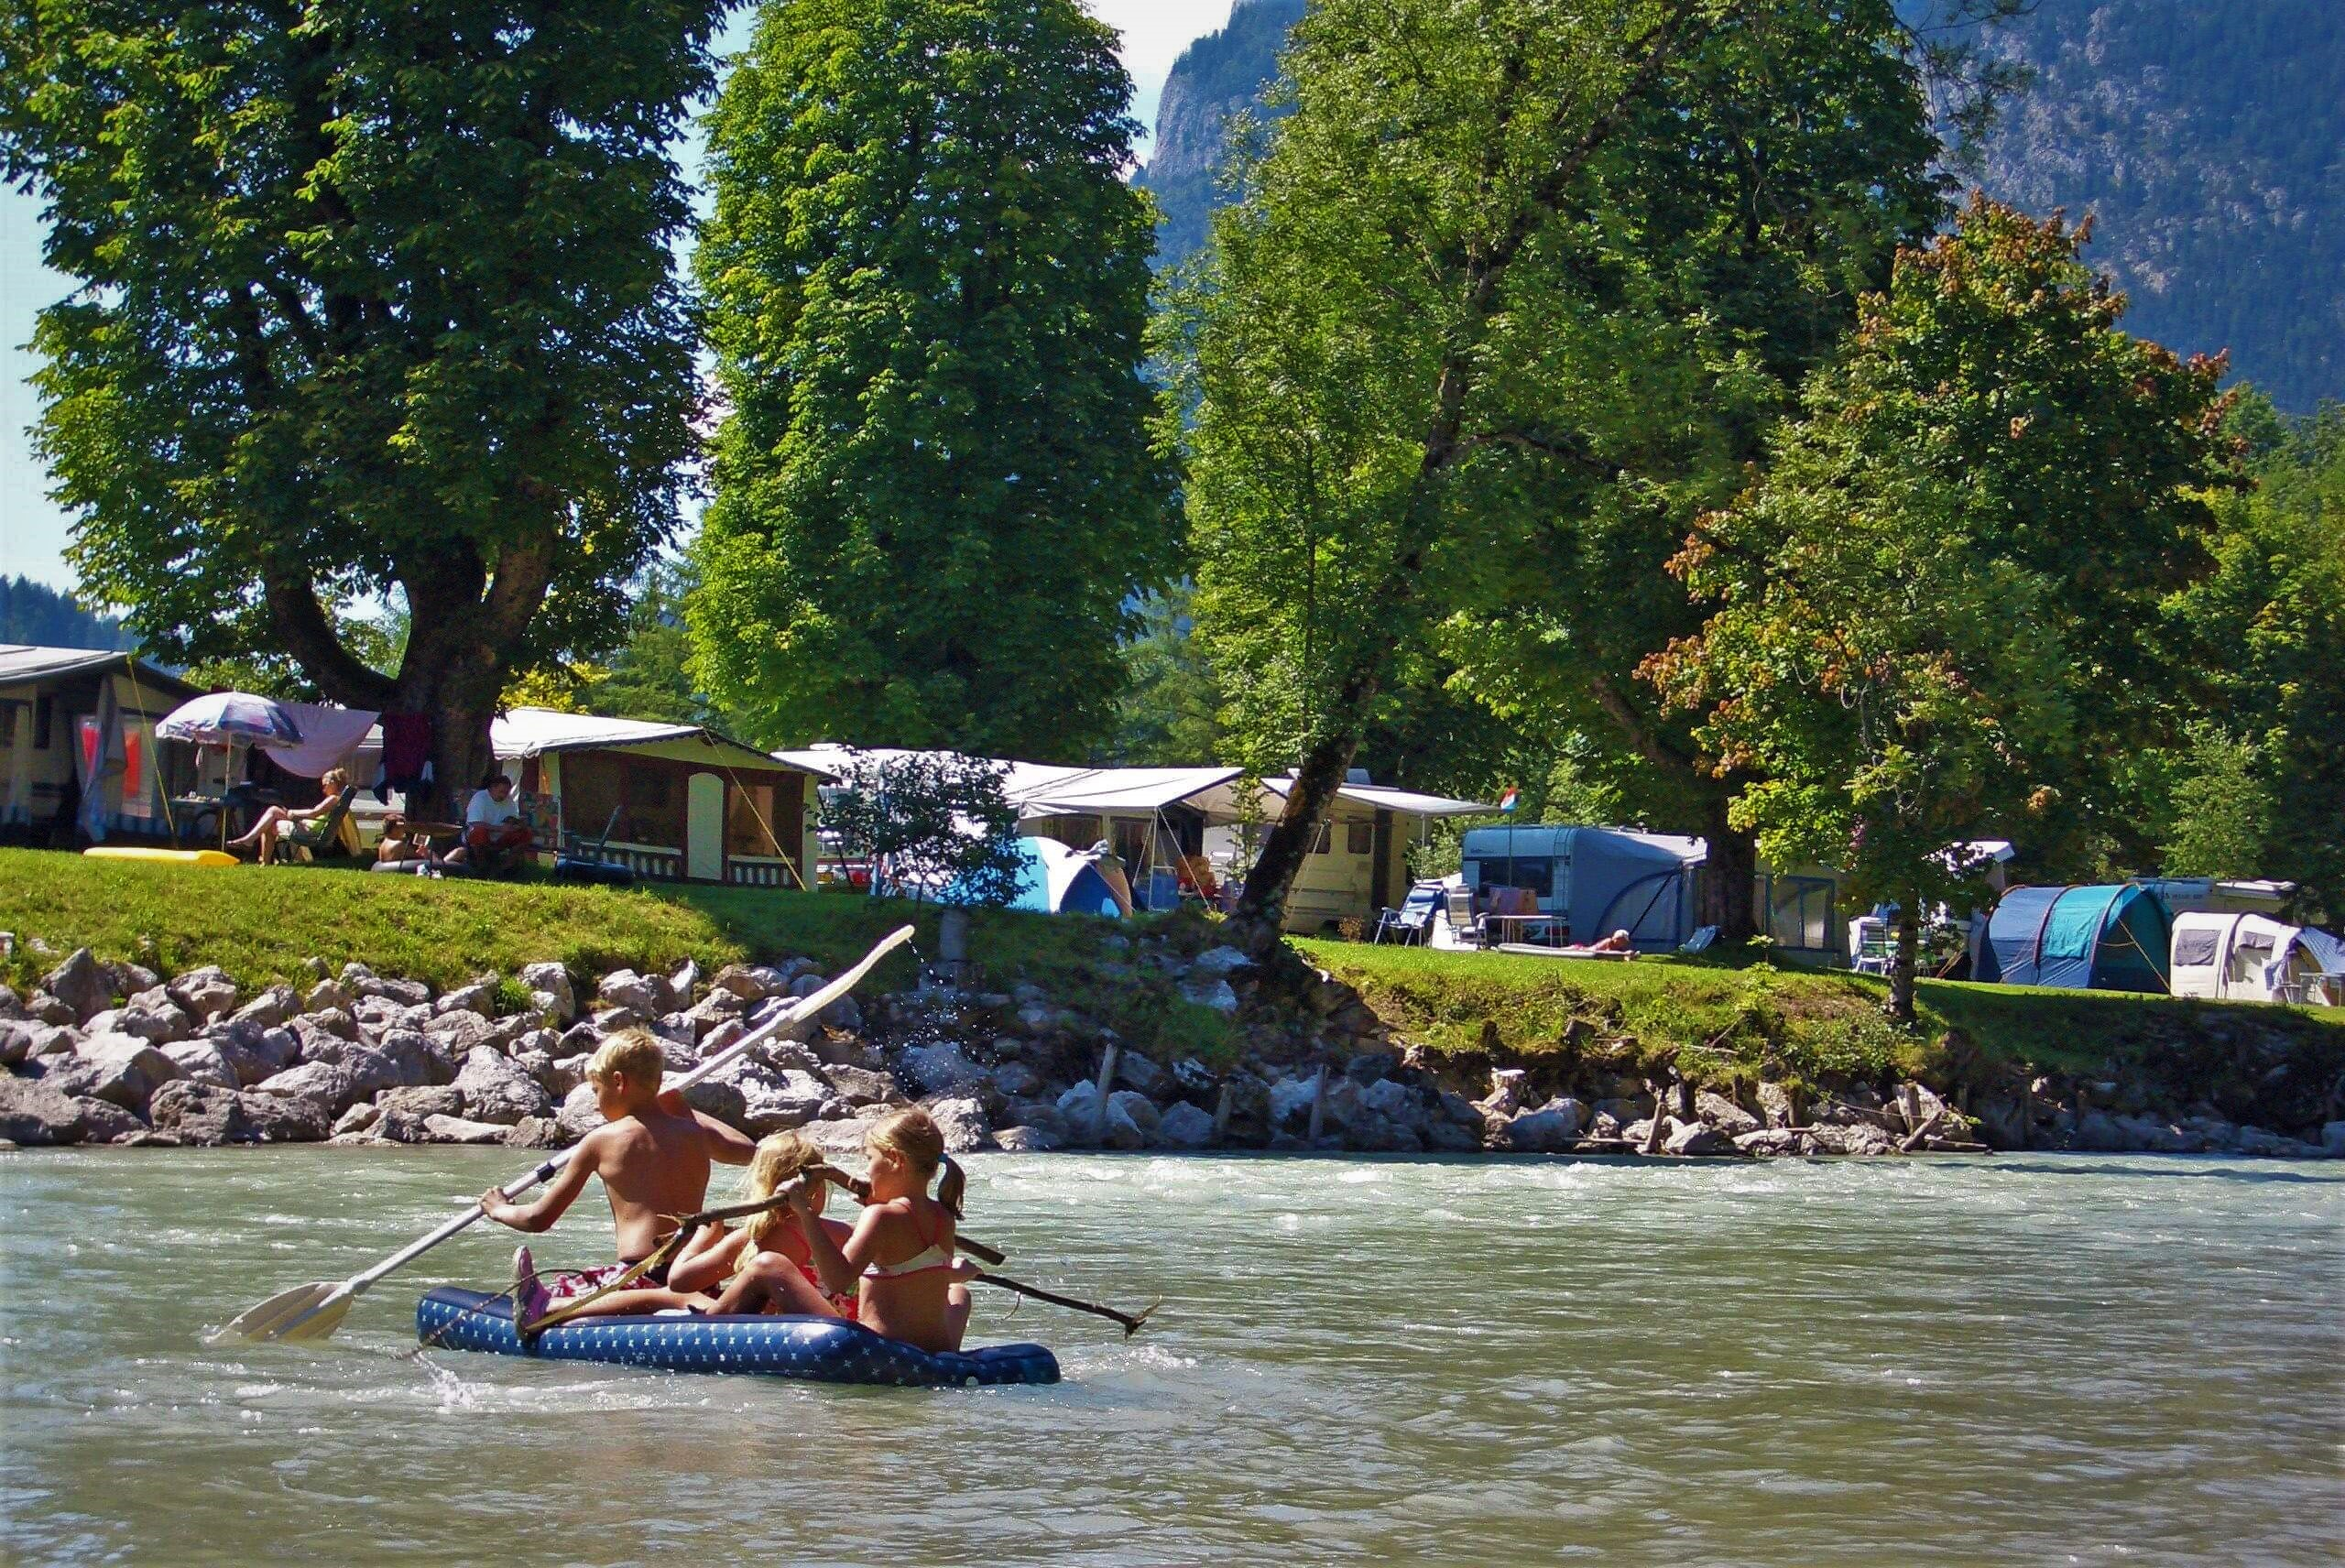 Kinder in der Saalach | © Grubhof Camping GmbH